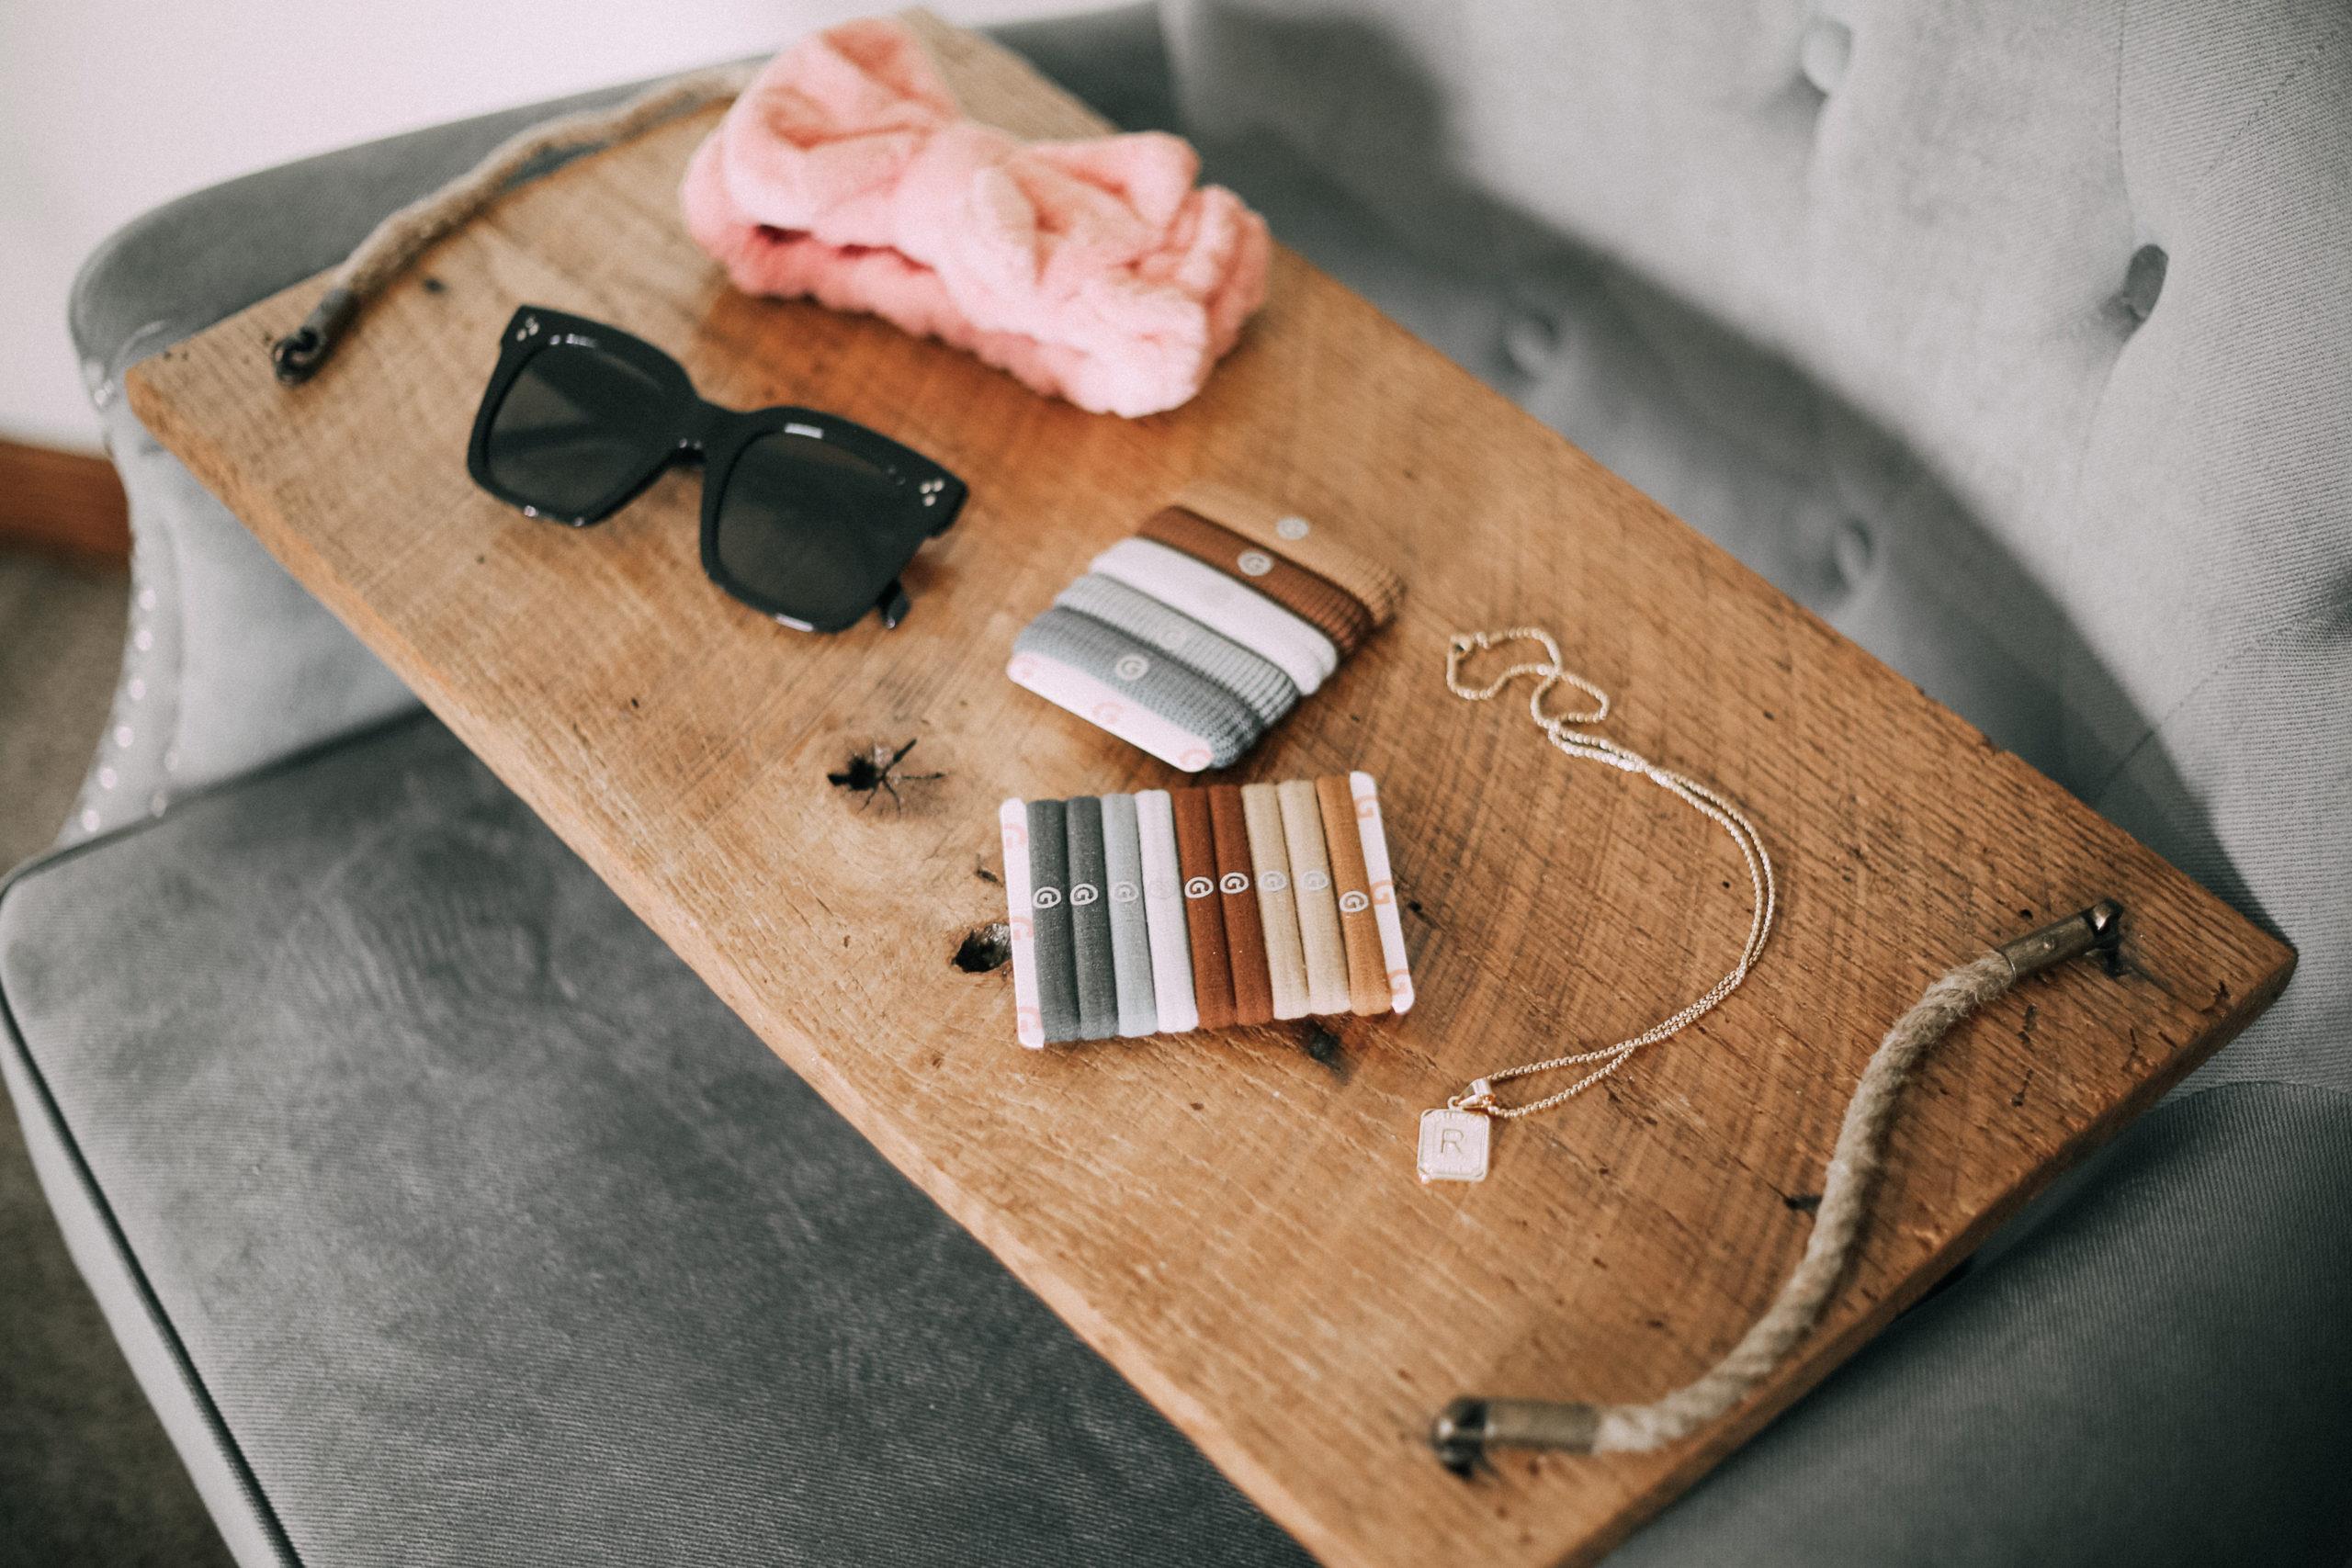 amazon finds, Celine dupes, sunglasses, amazon, amazon prime, monogram necklace